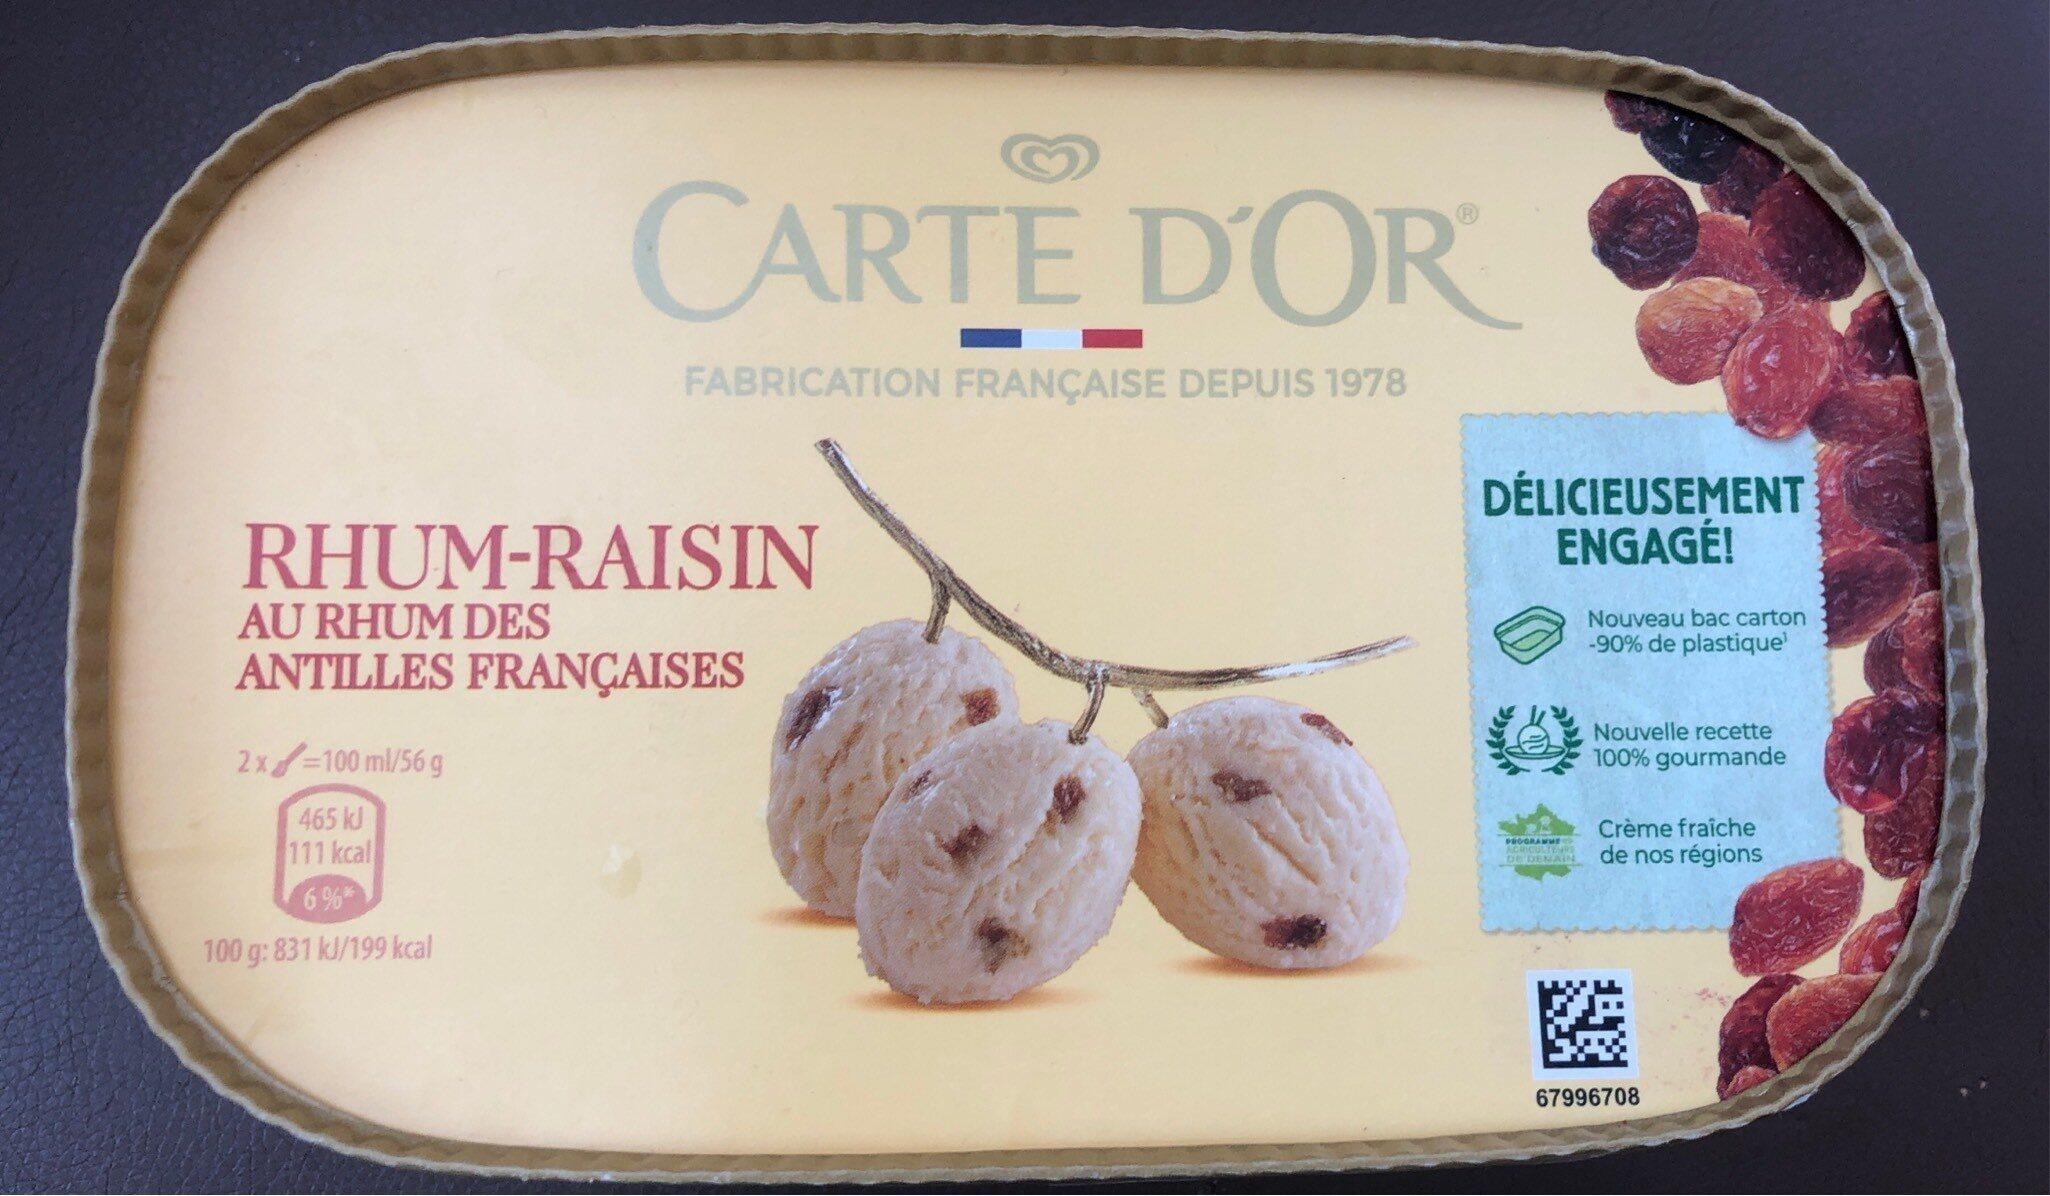 Carte D'or Glace Rhum Raisins - Produit - fr